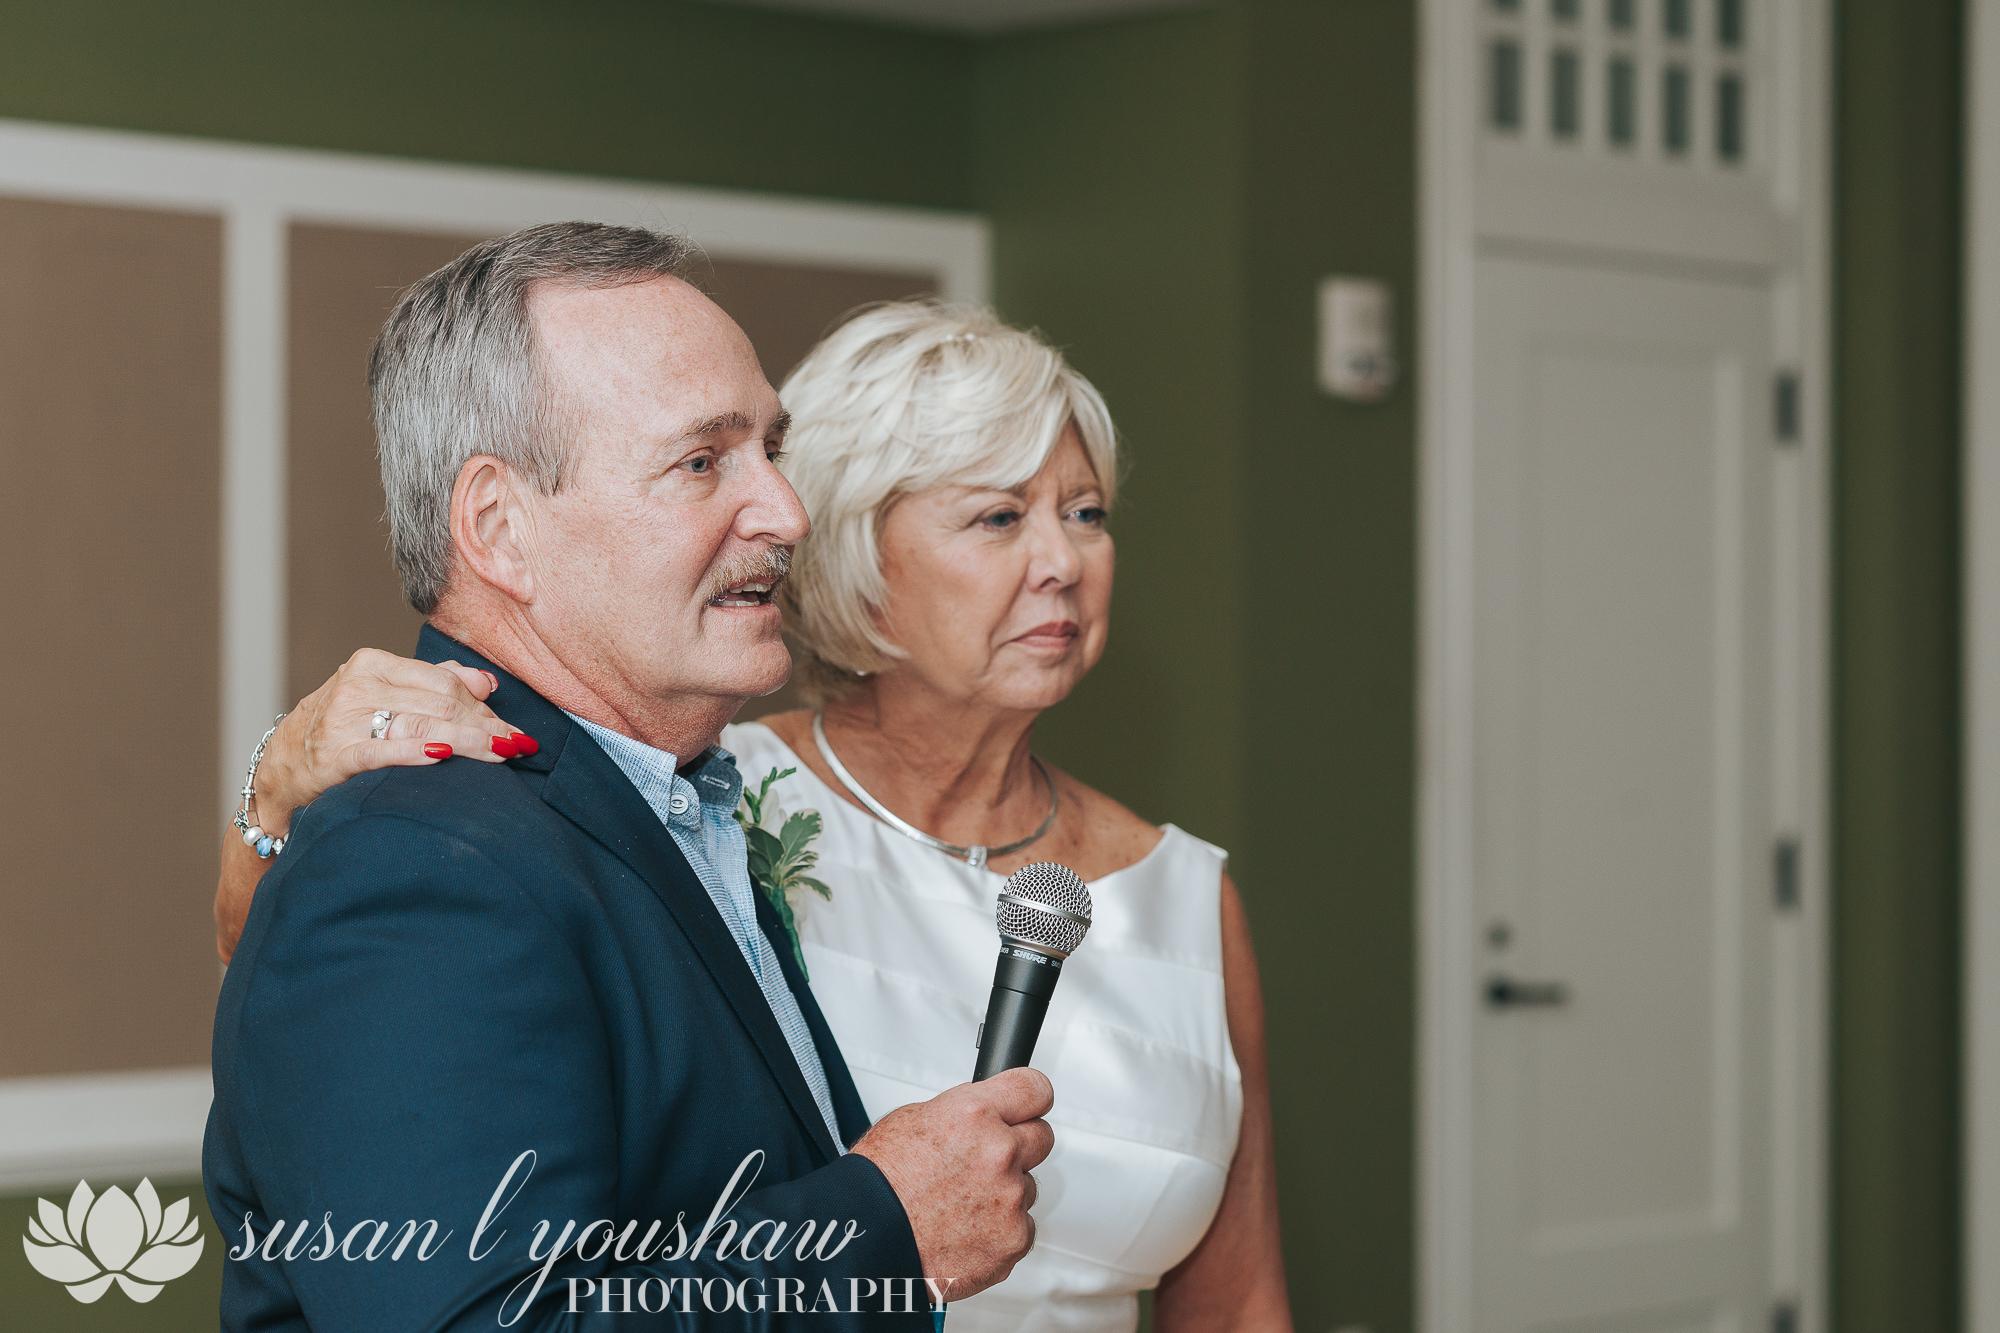 BLOG Carolyn Adams and Jim McCune 07-04-2018 SLY Photography-149.jpg